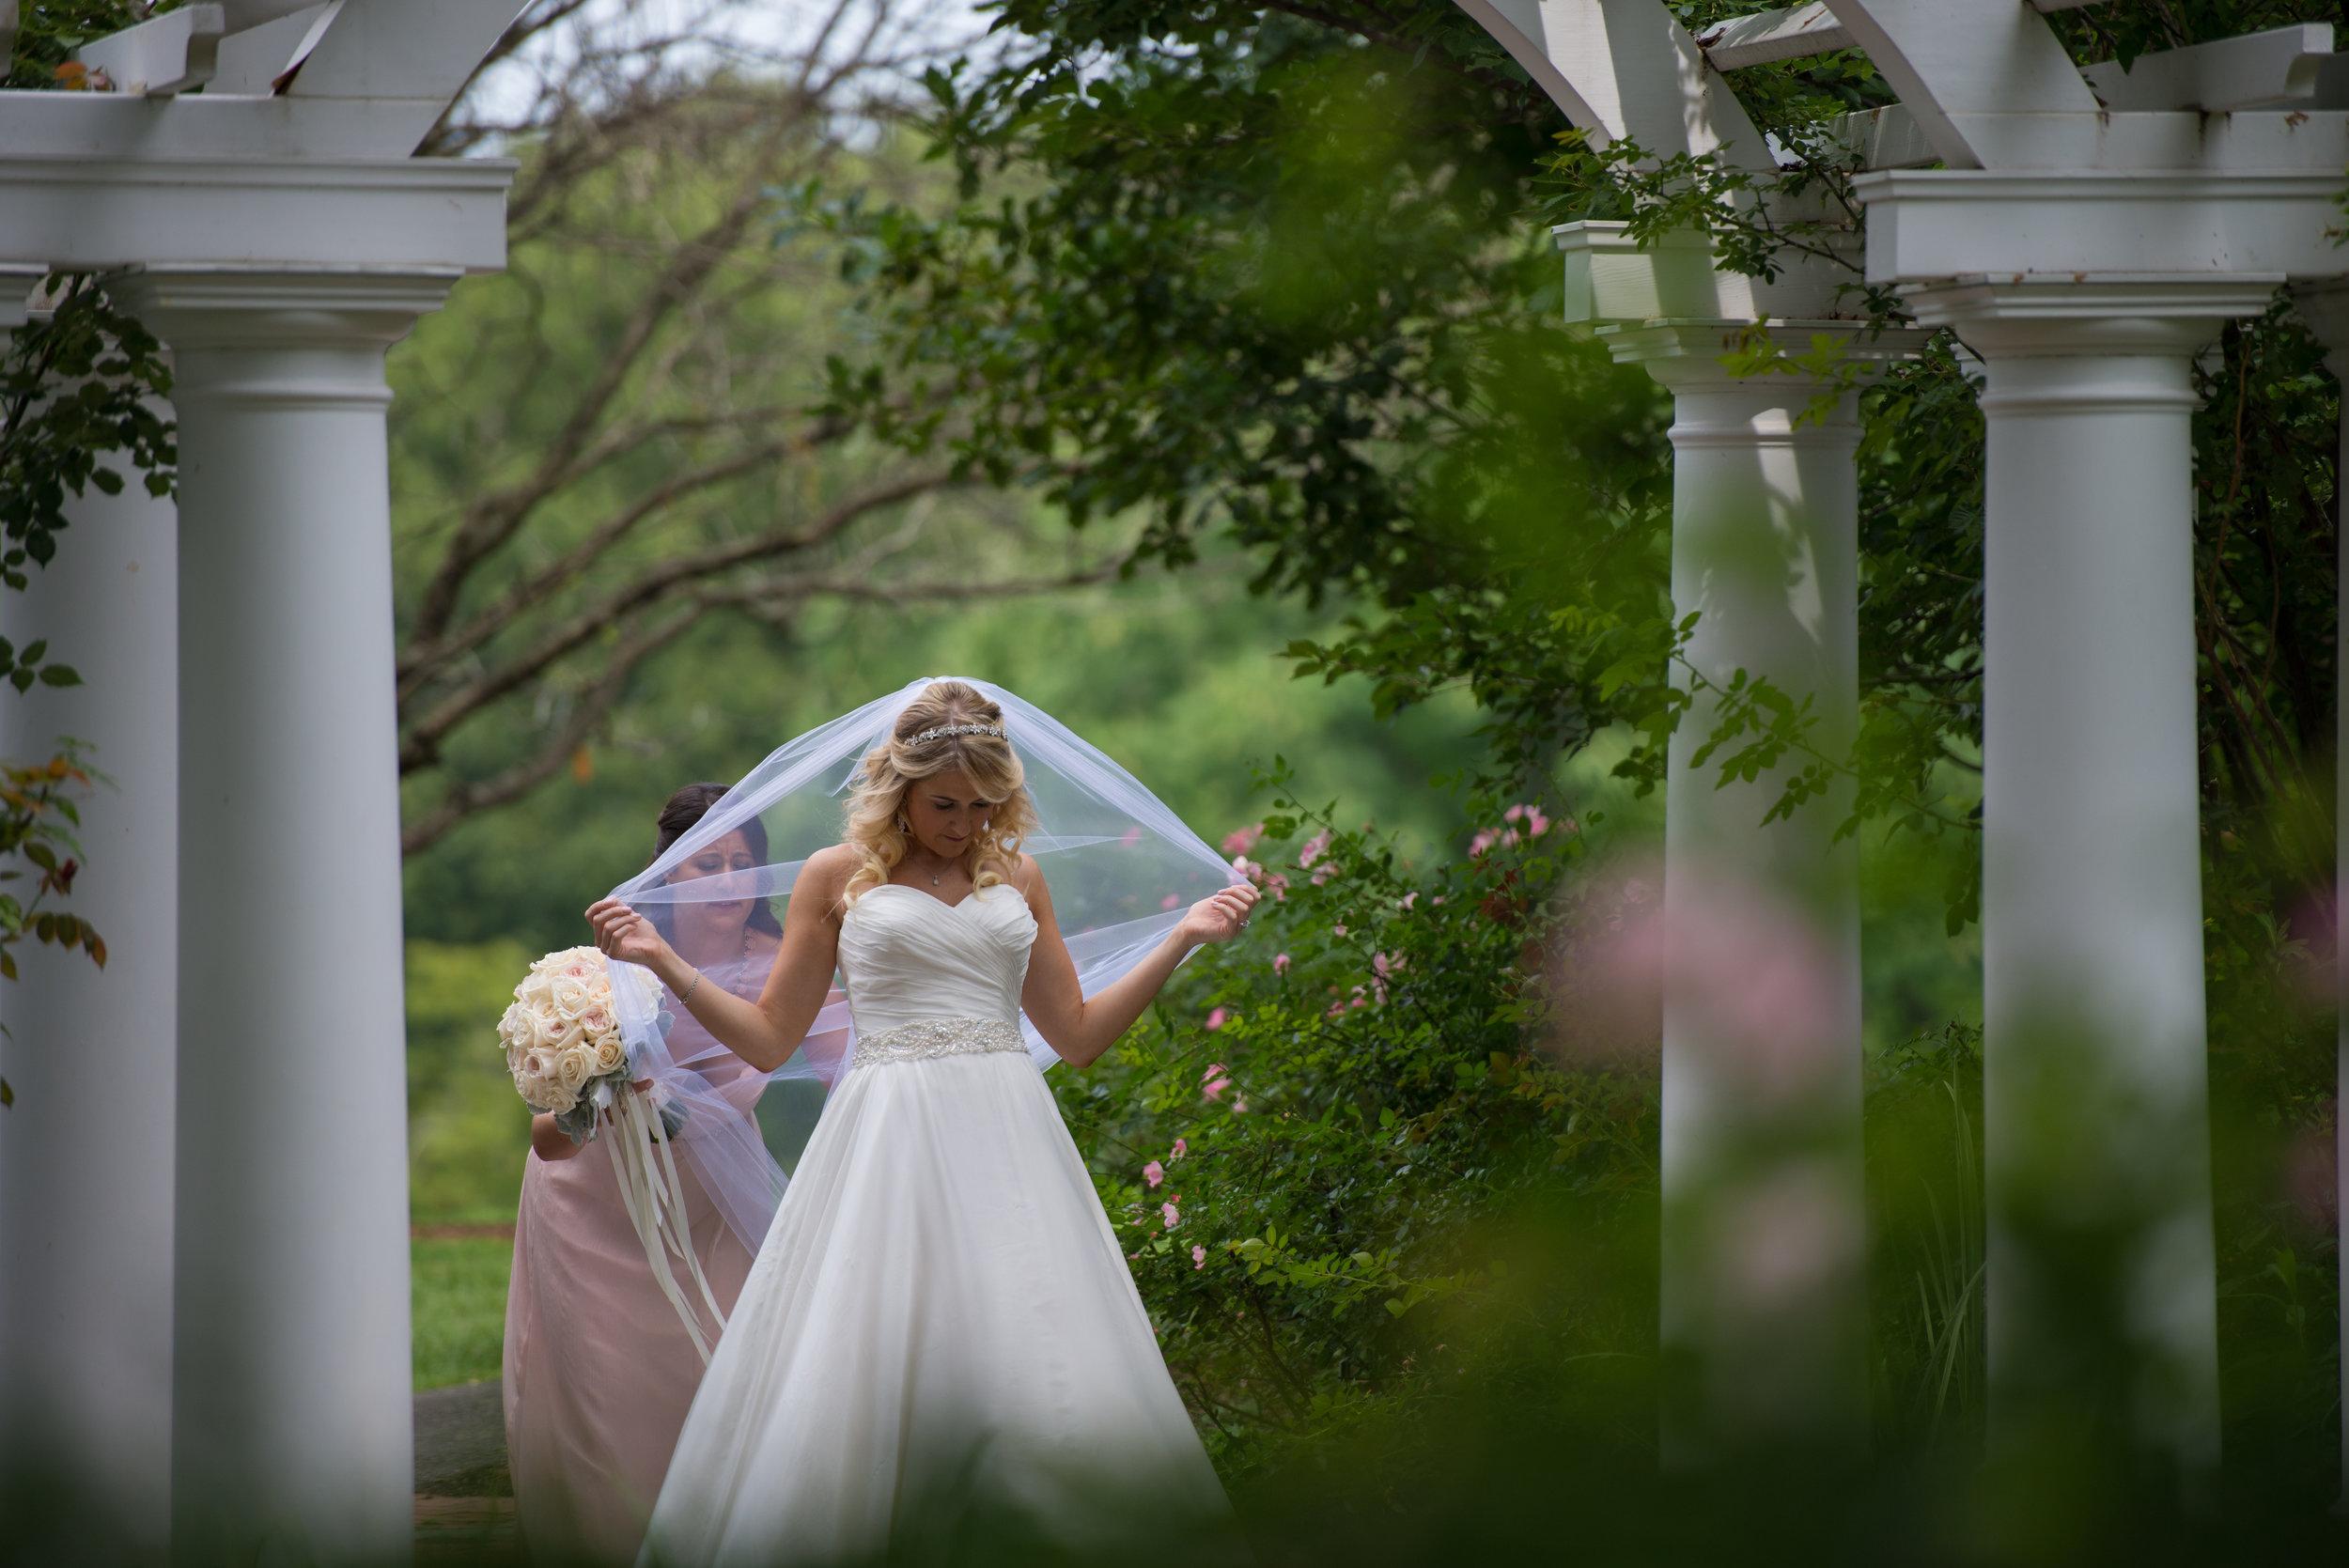 Wedding First Look Photos00905.jpg